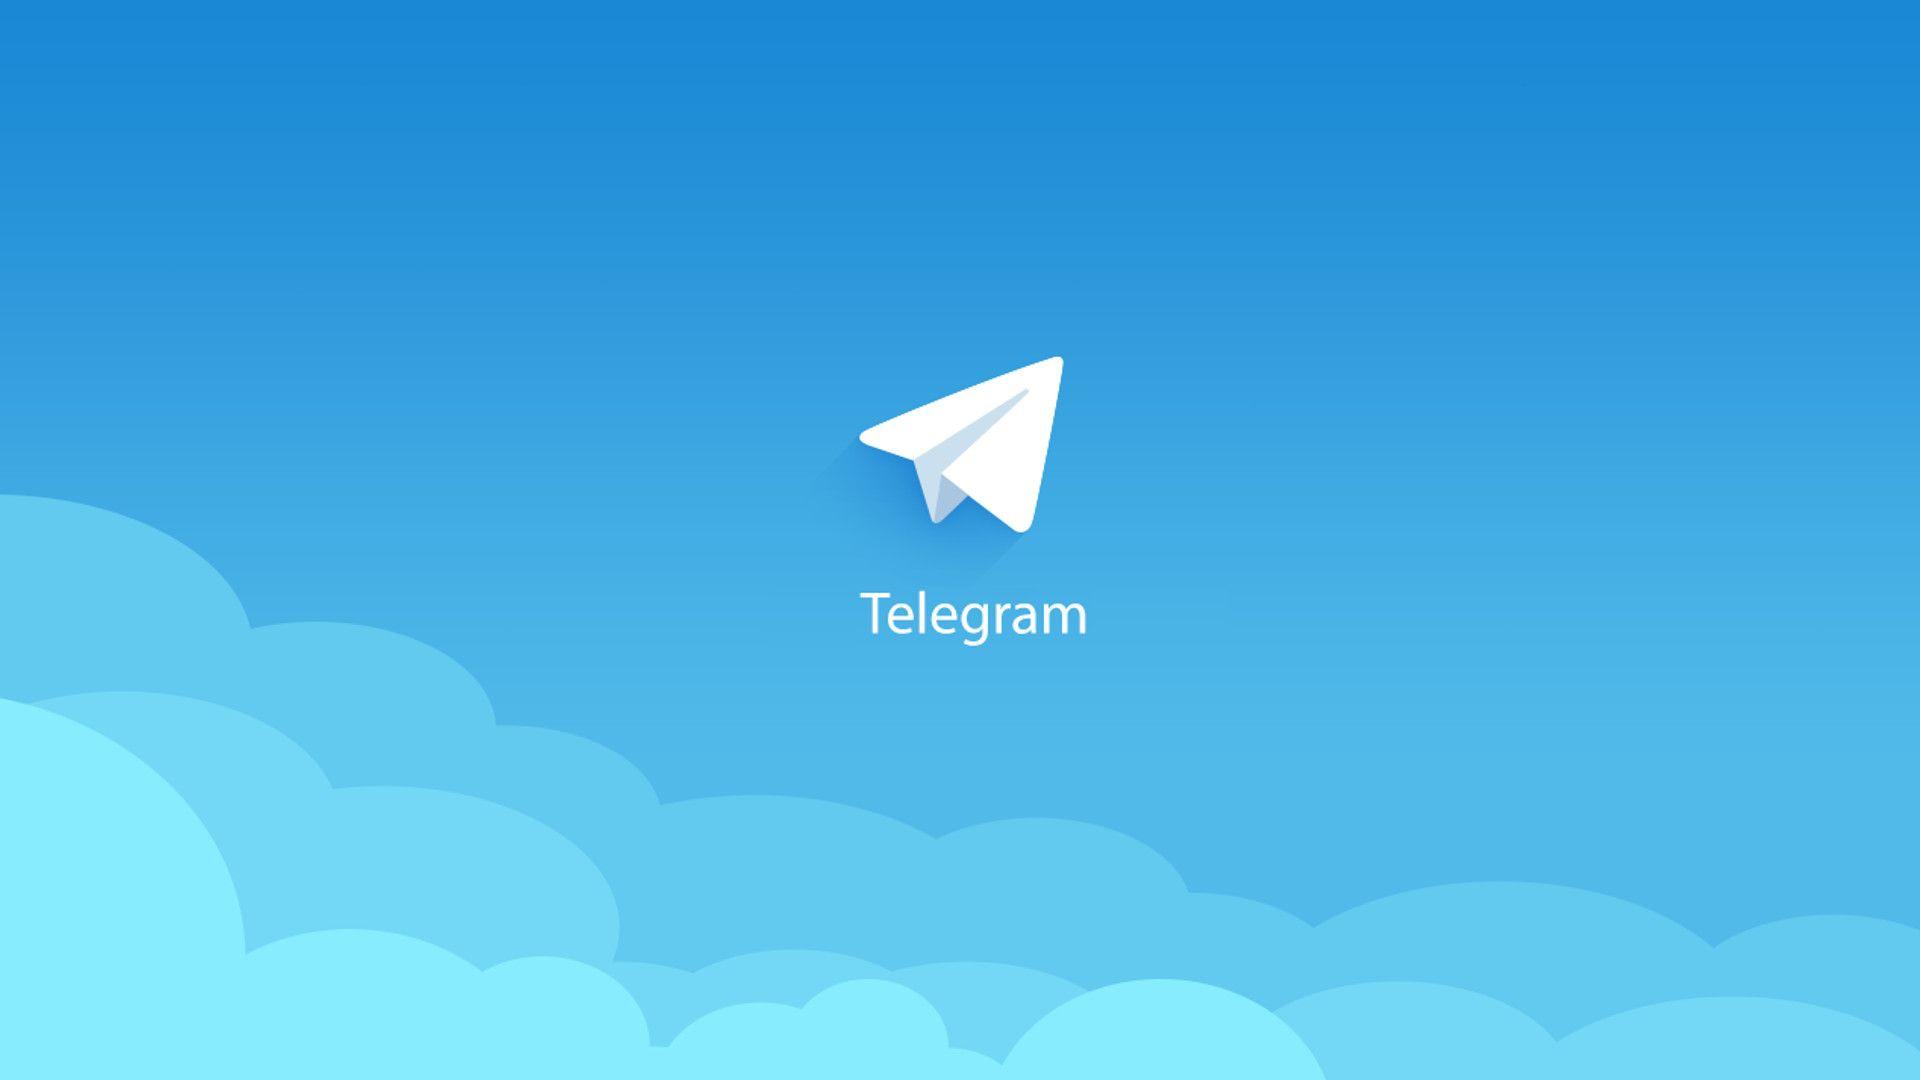 Telegram: raggiunti i 500 milioni di utenti attivi - HUAWEI Community